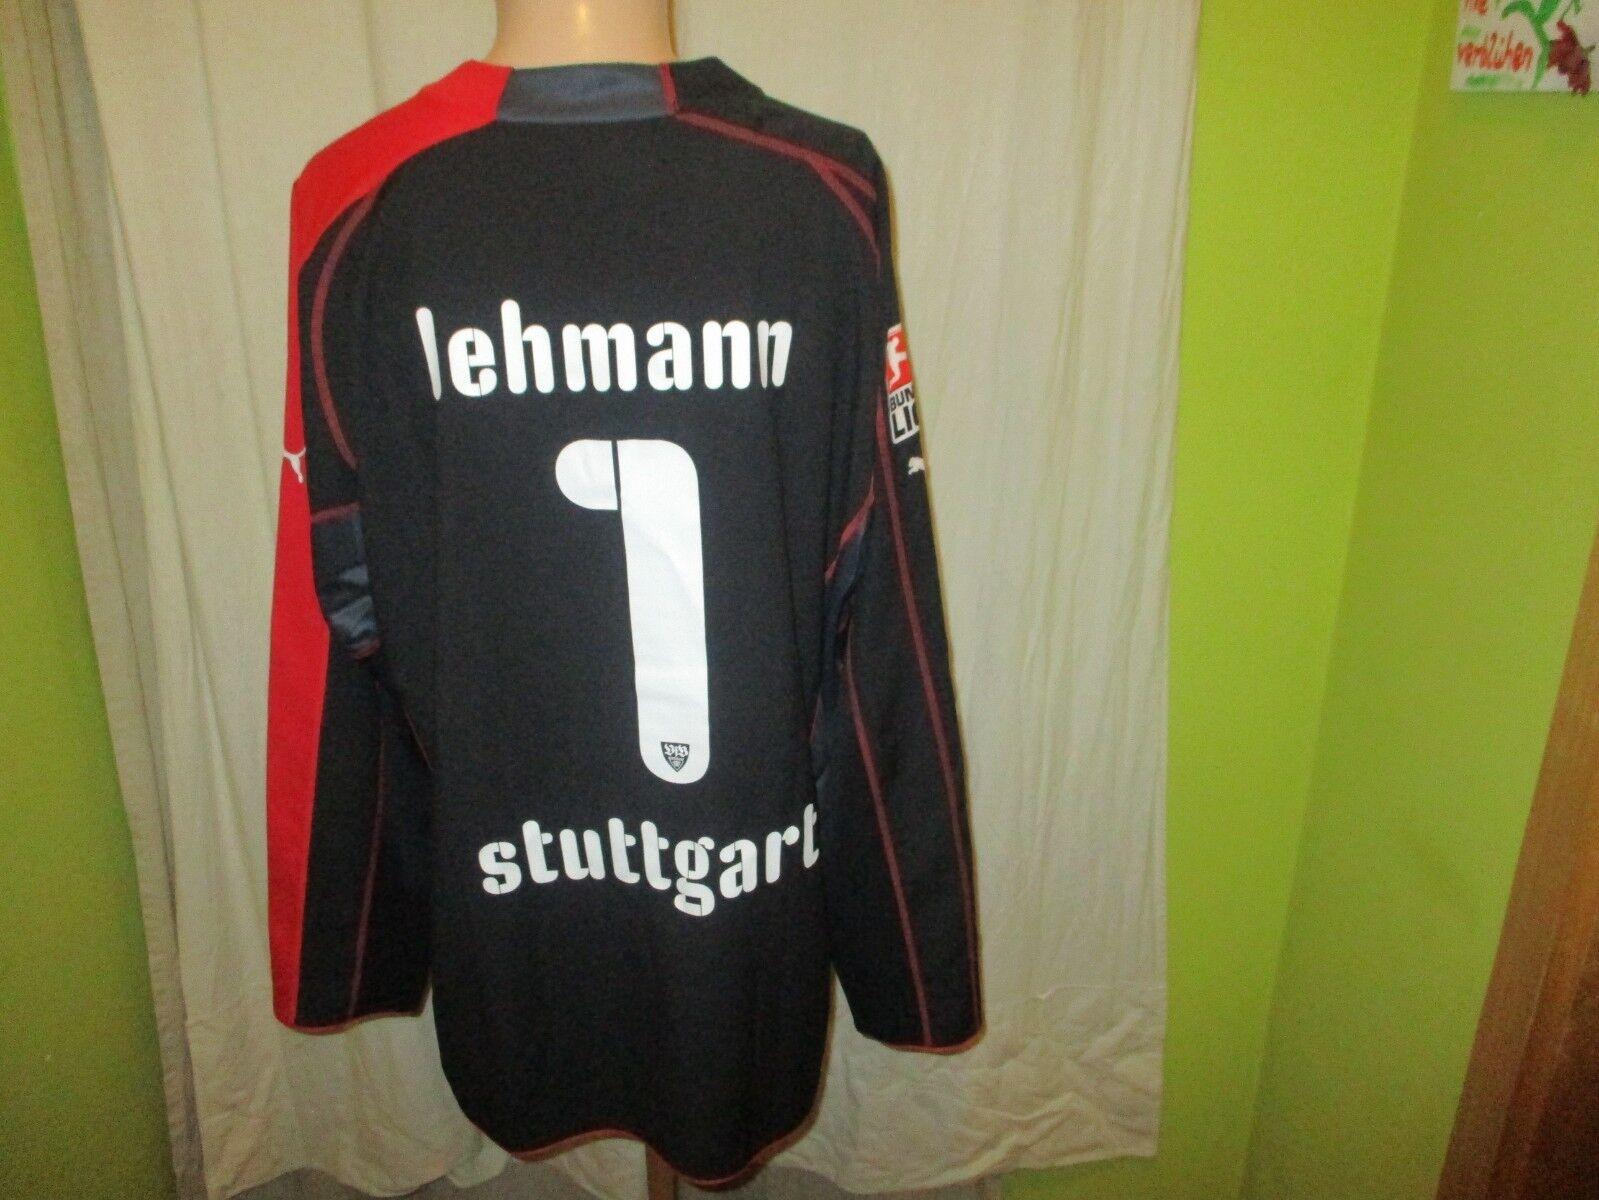 VfB Stuttgart Puma Torwart Trikot 2005 06  EnBW    + Nr.1 Lehmann Gr.XXL Neu e98b66